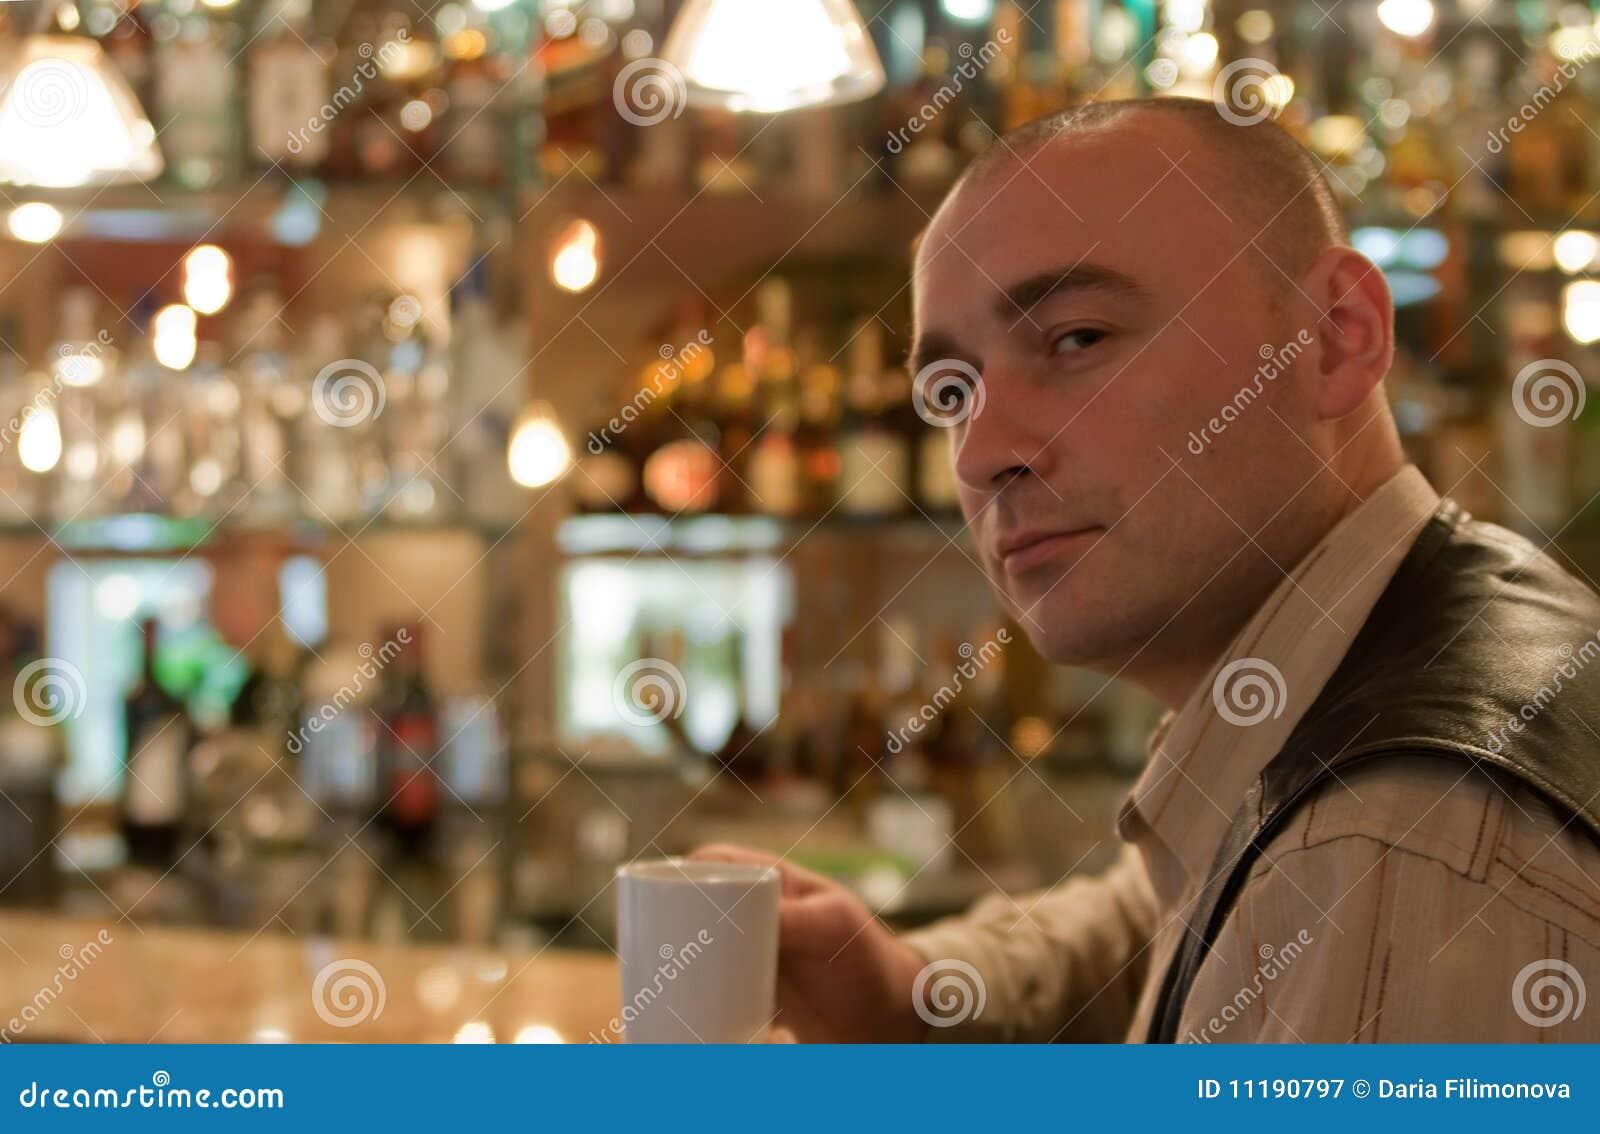 Men in coffee room